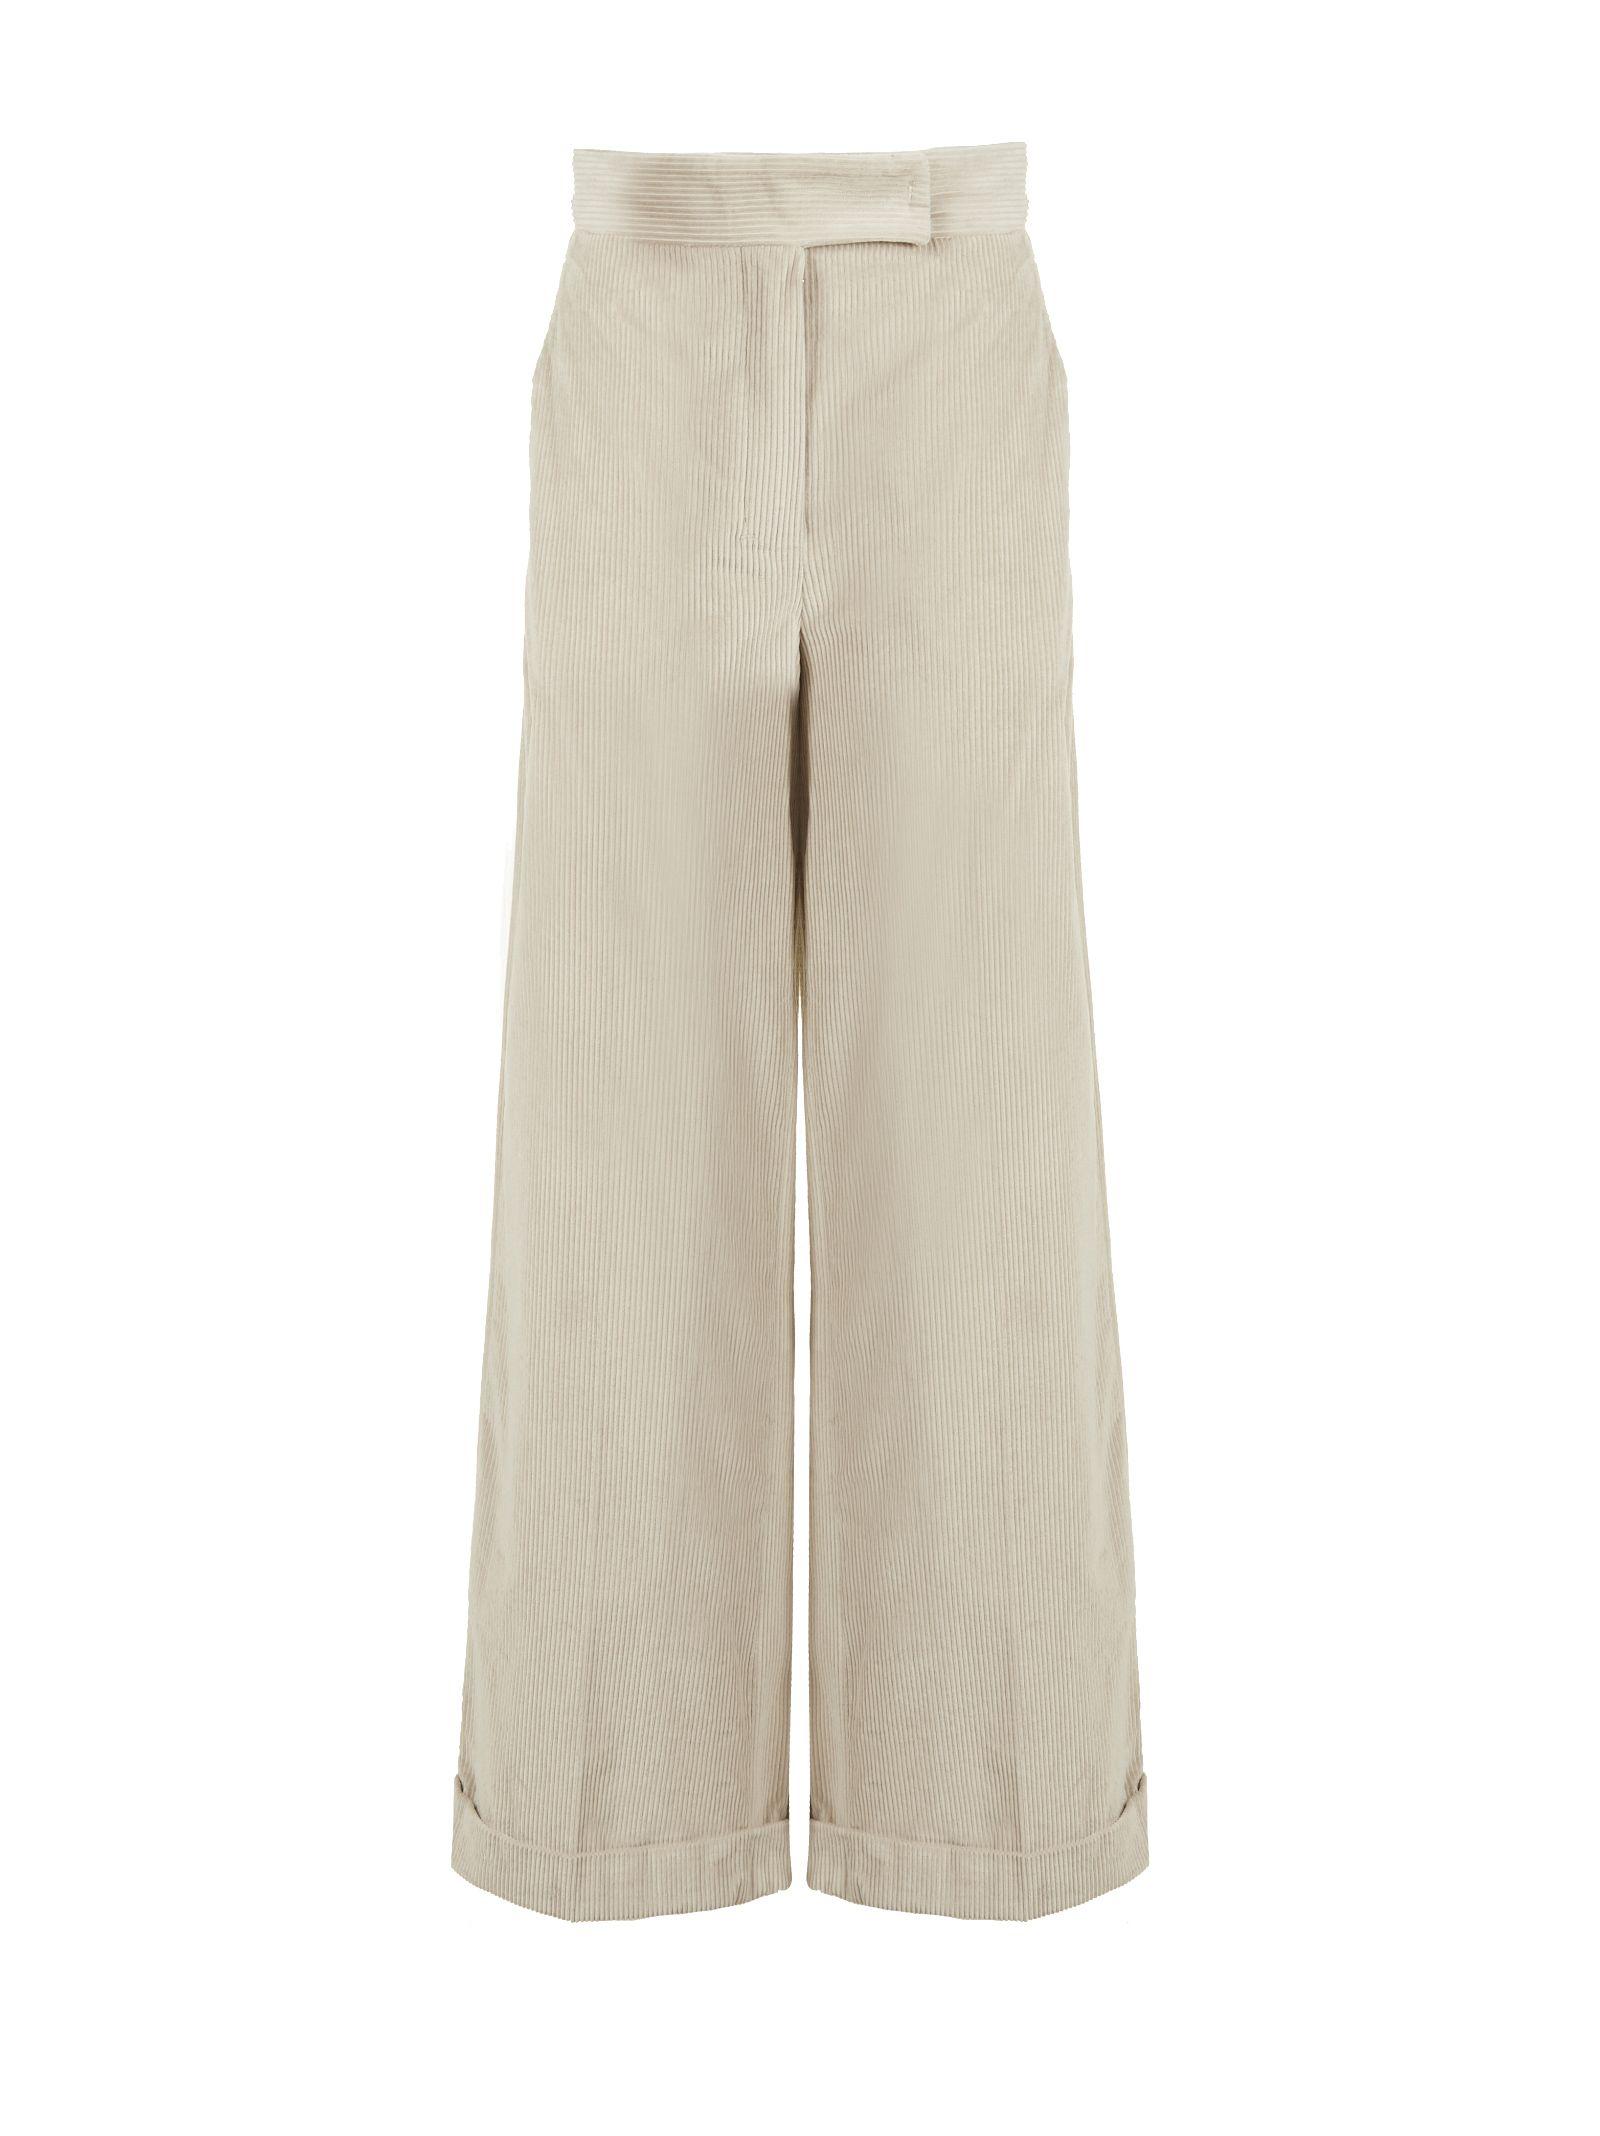 Max Mara Studio Cropped Wide Leg Trousers